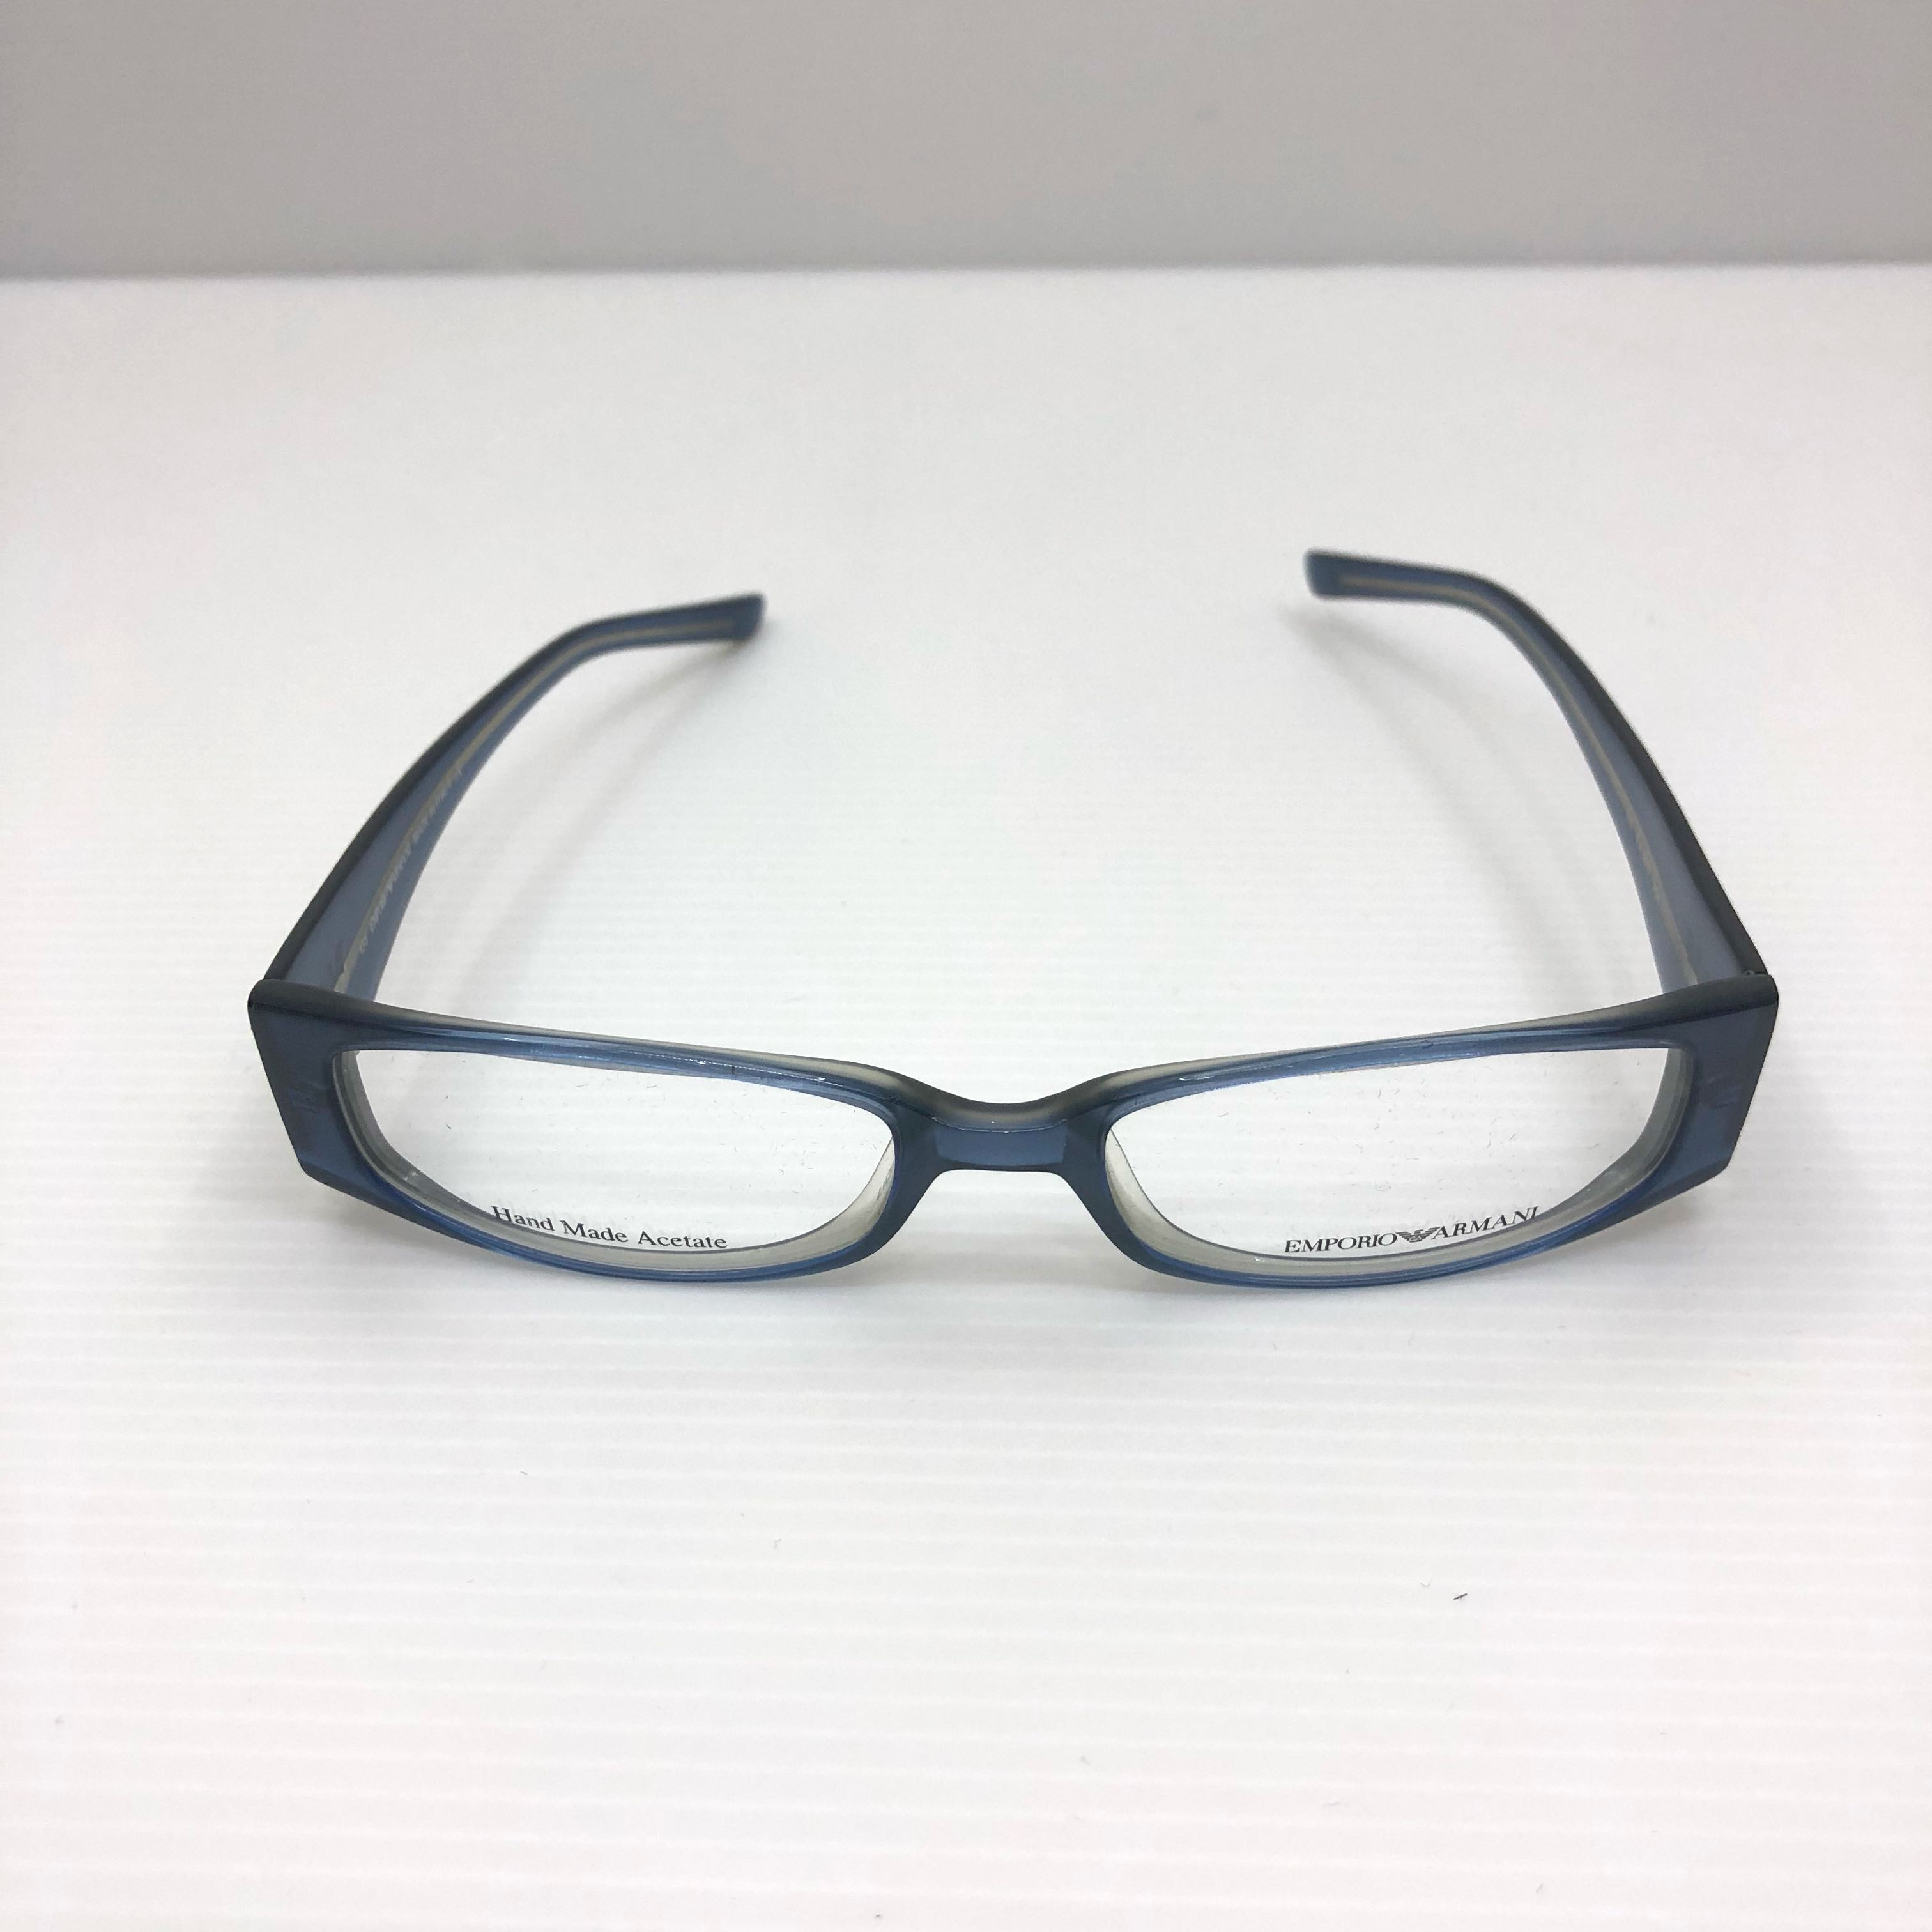 d82eeddb7784 Emporio Armani EA9011 Glasses